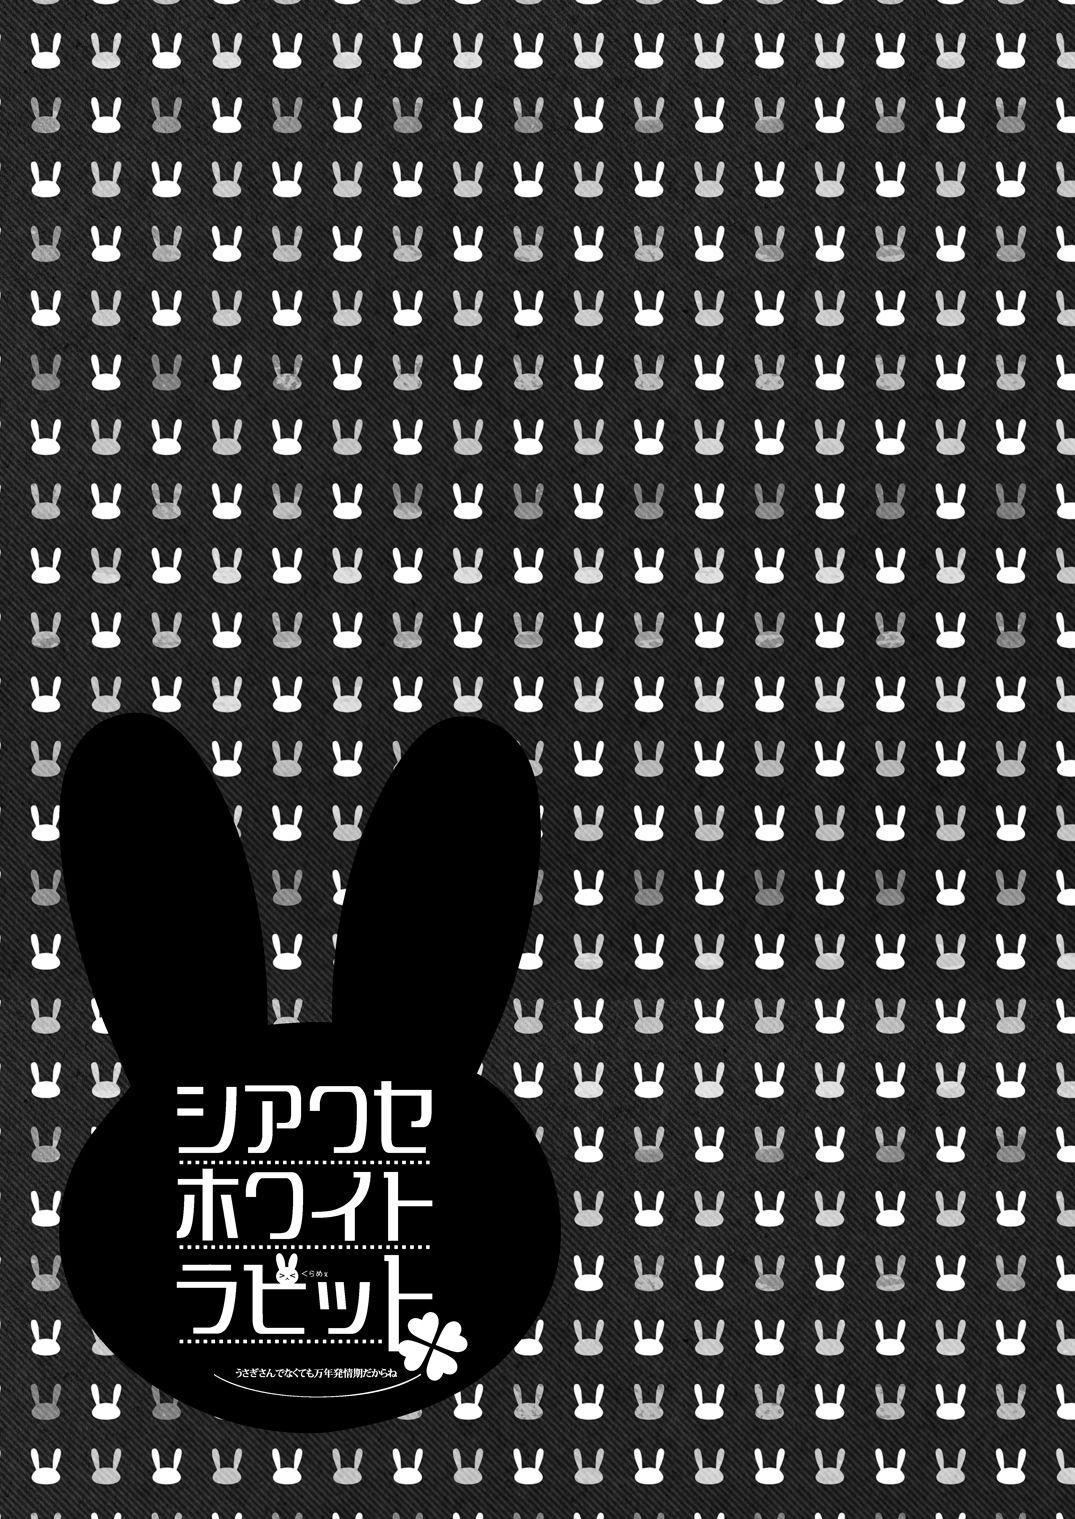 Shiawase White Rabbit 29